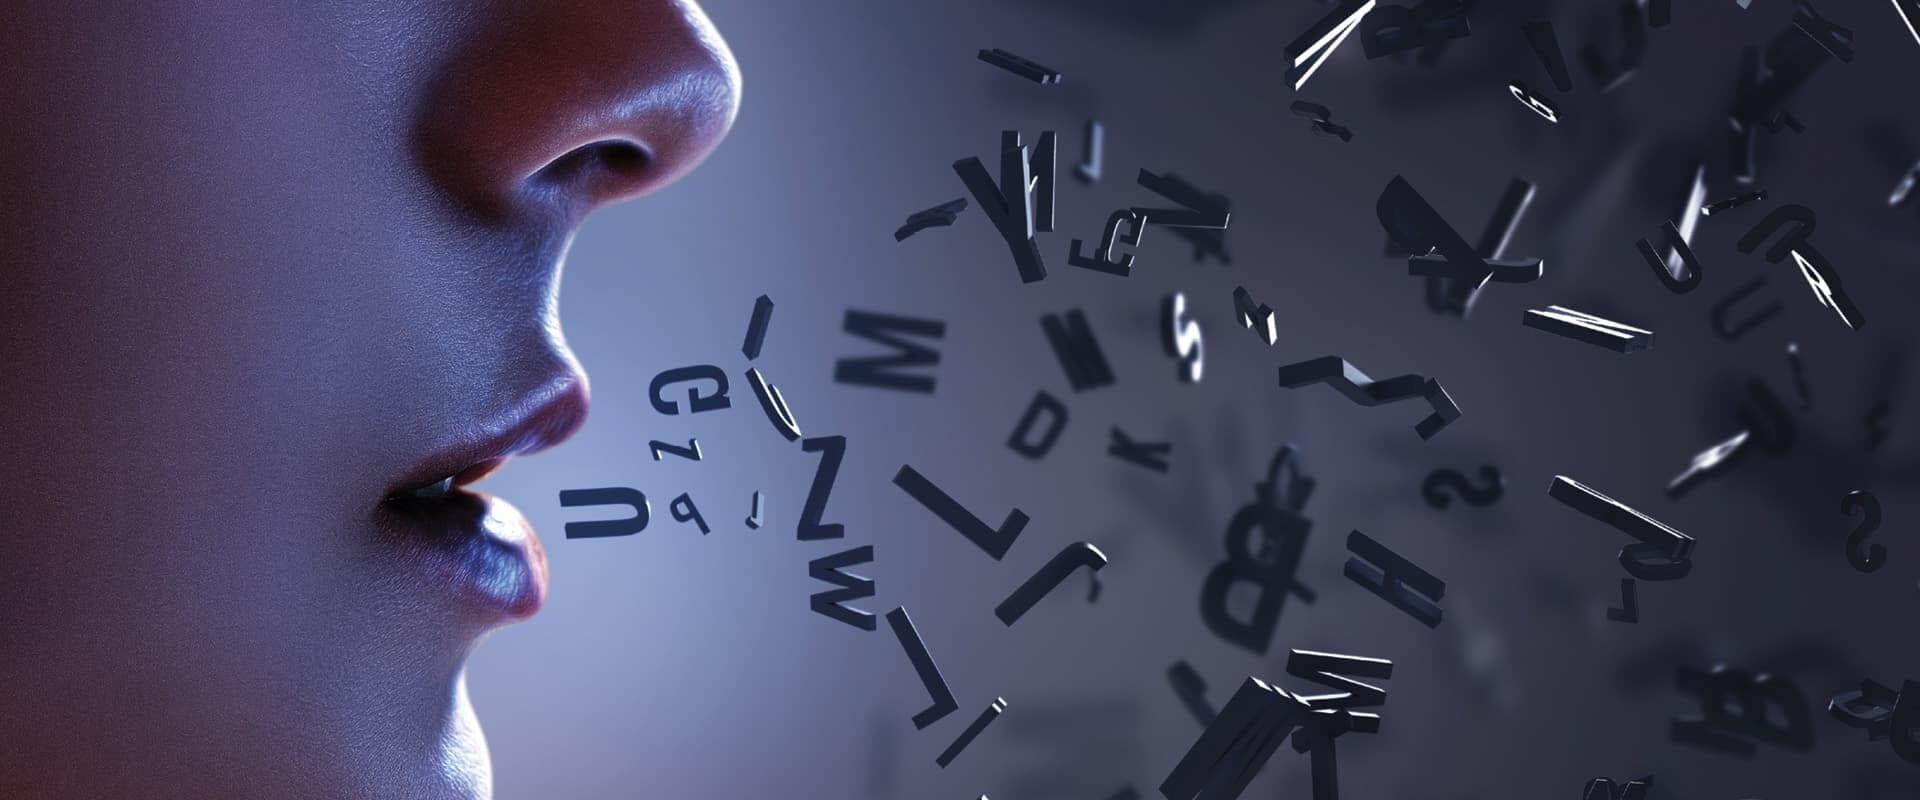 AT335-Main_Images-F3-min(lassedesignen/shutterstock.com) Communication Strategies